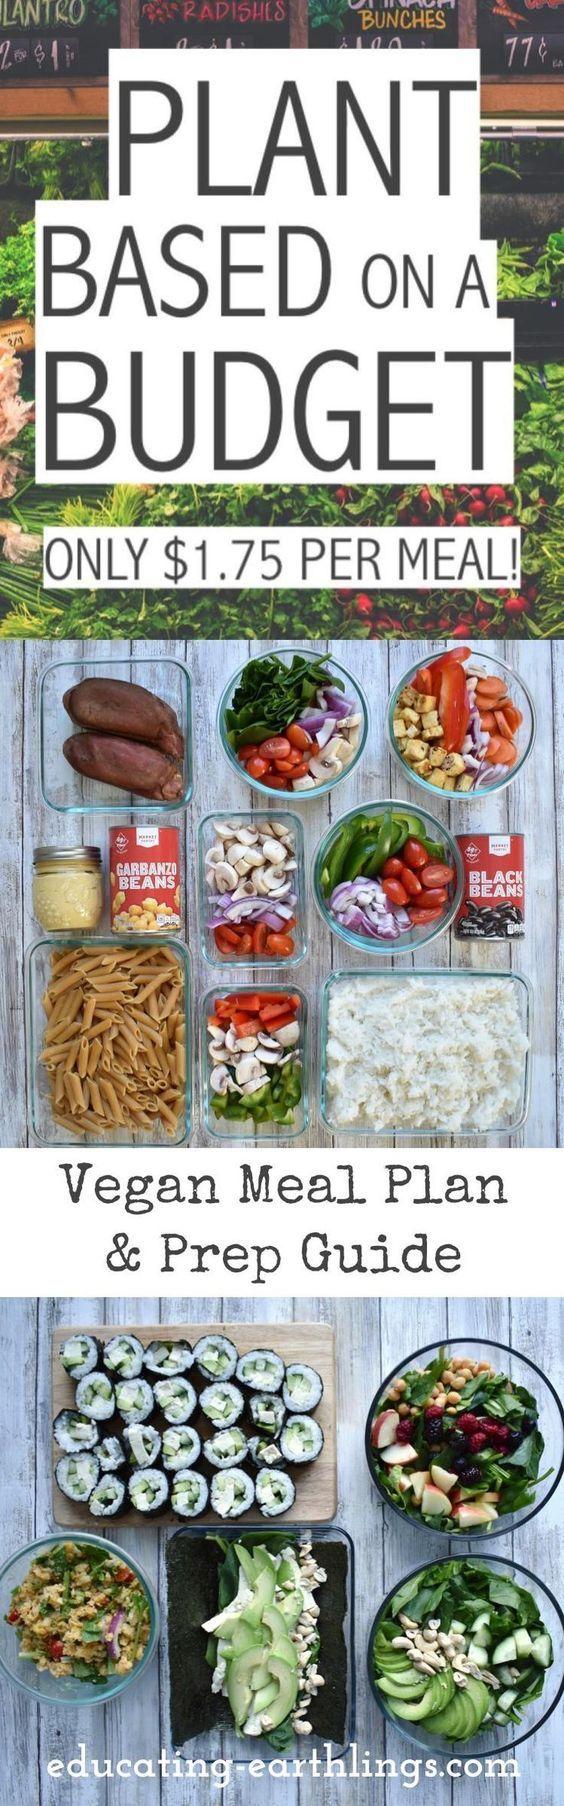 Plant Based On A Budget Vegan Meal Plan Vegan Meal Plans Vegan Cookbook Plant Based Diet